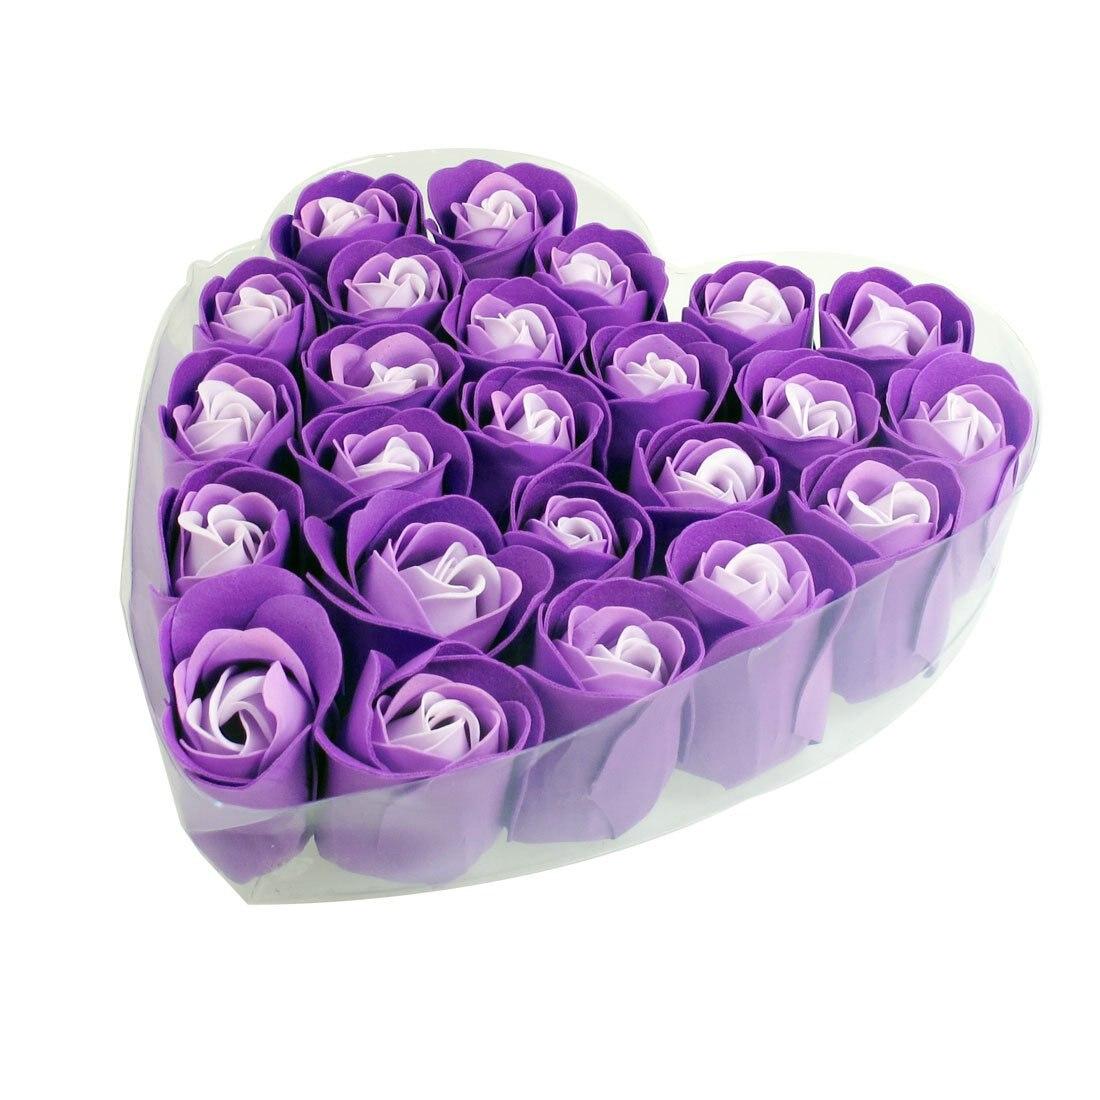 New  24 Pcs Purple Scented Bath Soap Rose Petal In Heart Box